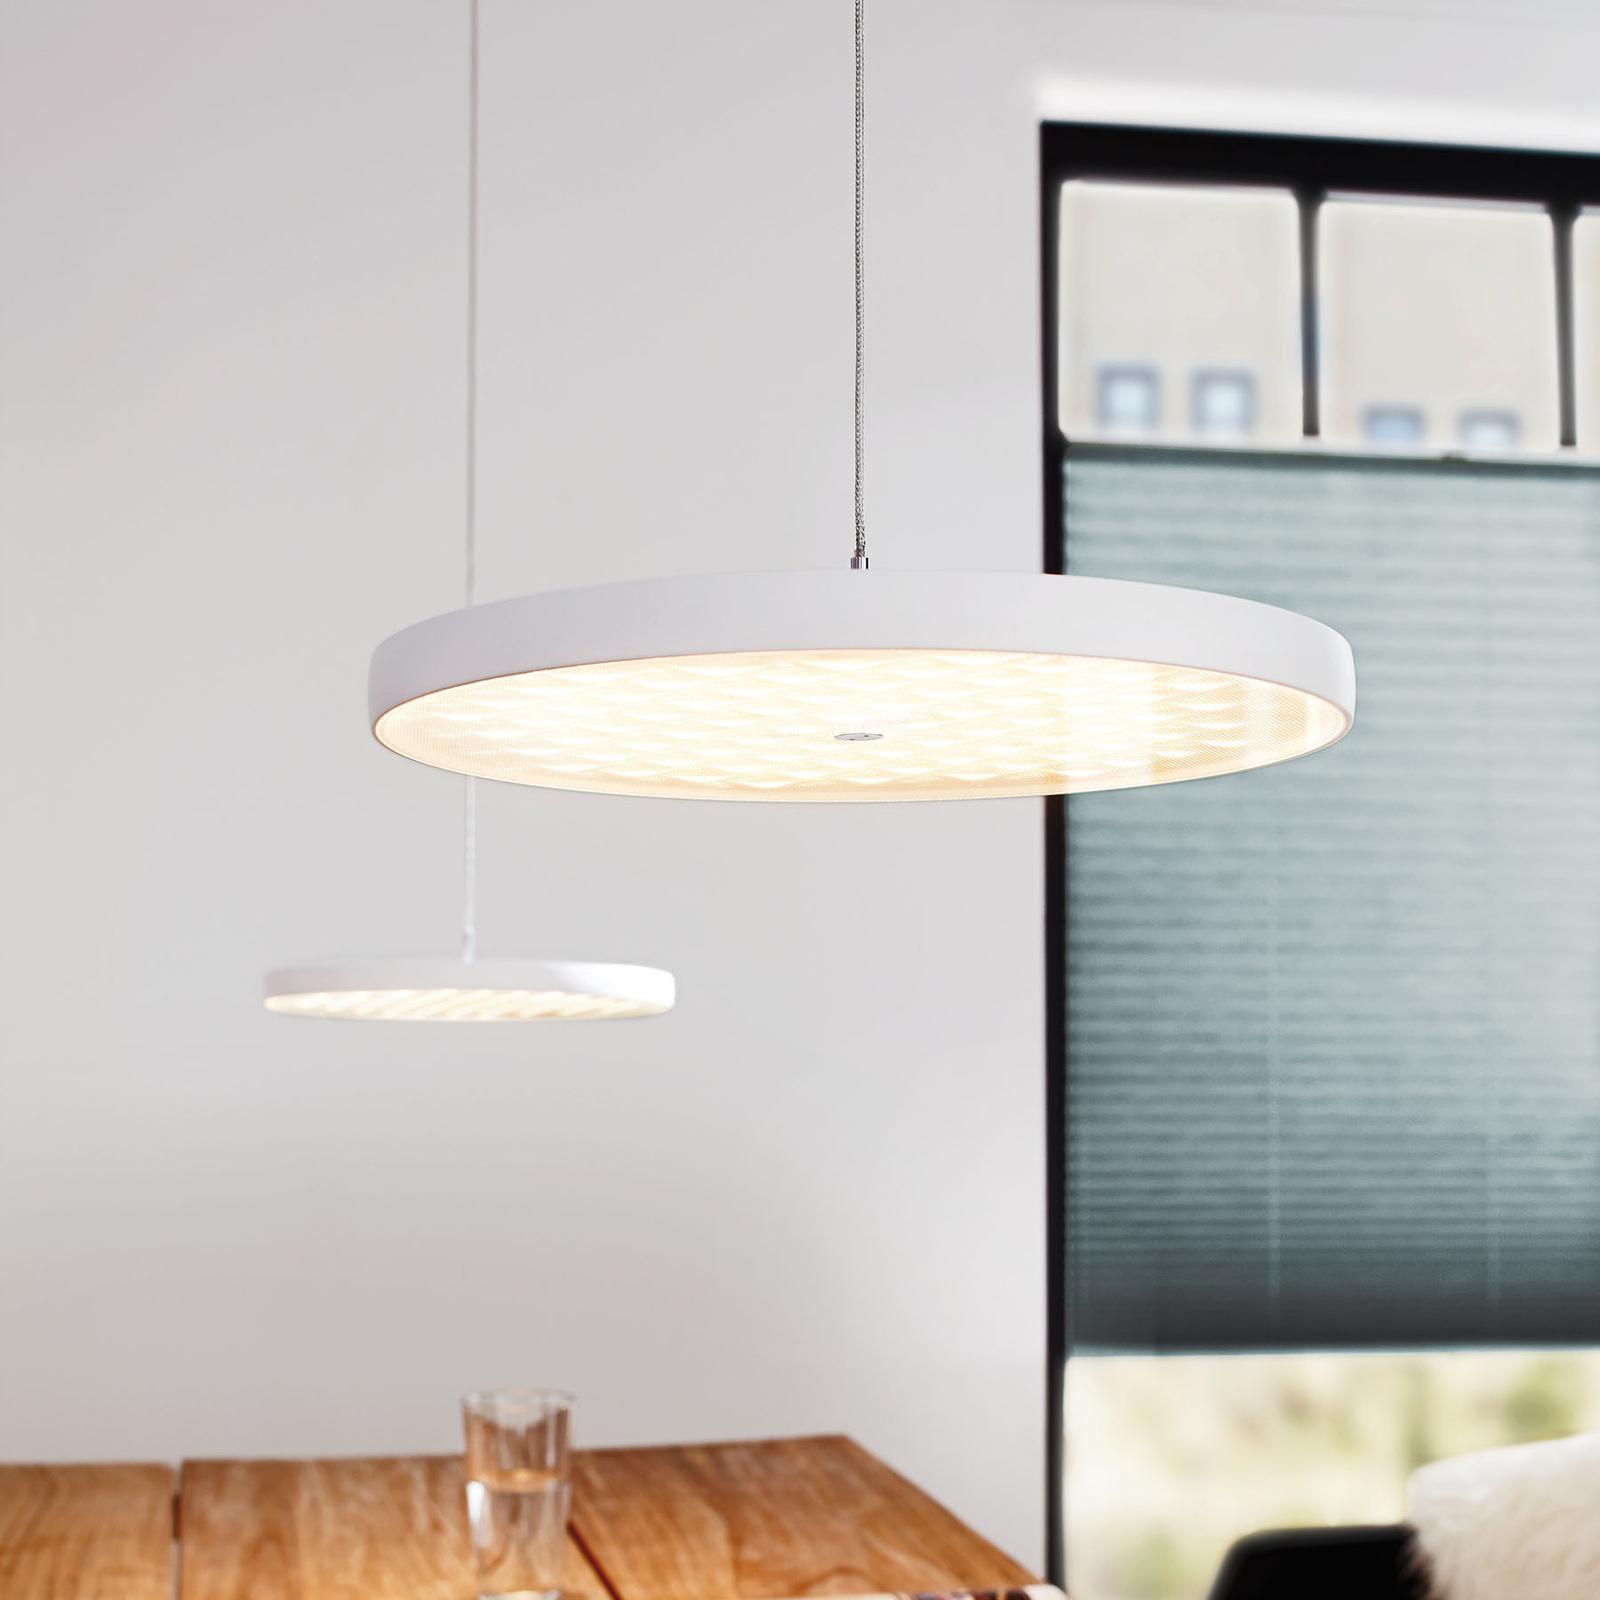 OLIGO Decent Max LED-riippuvalaisin, valkoinen